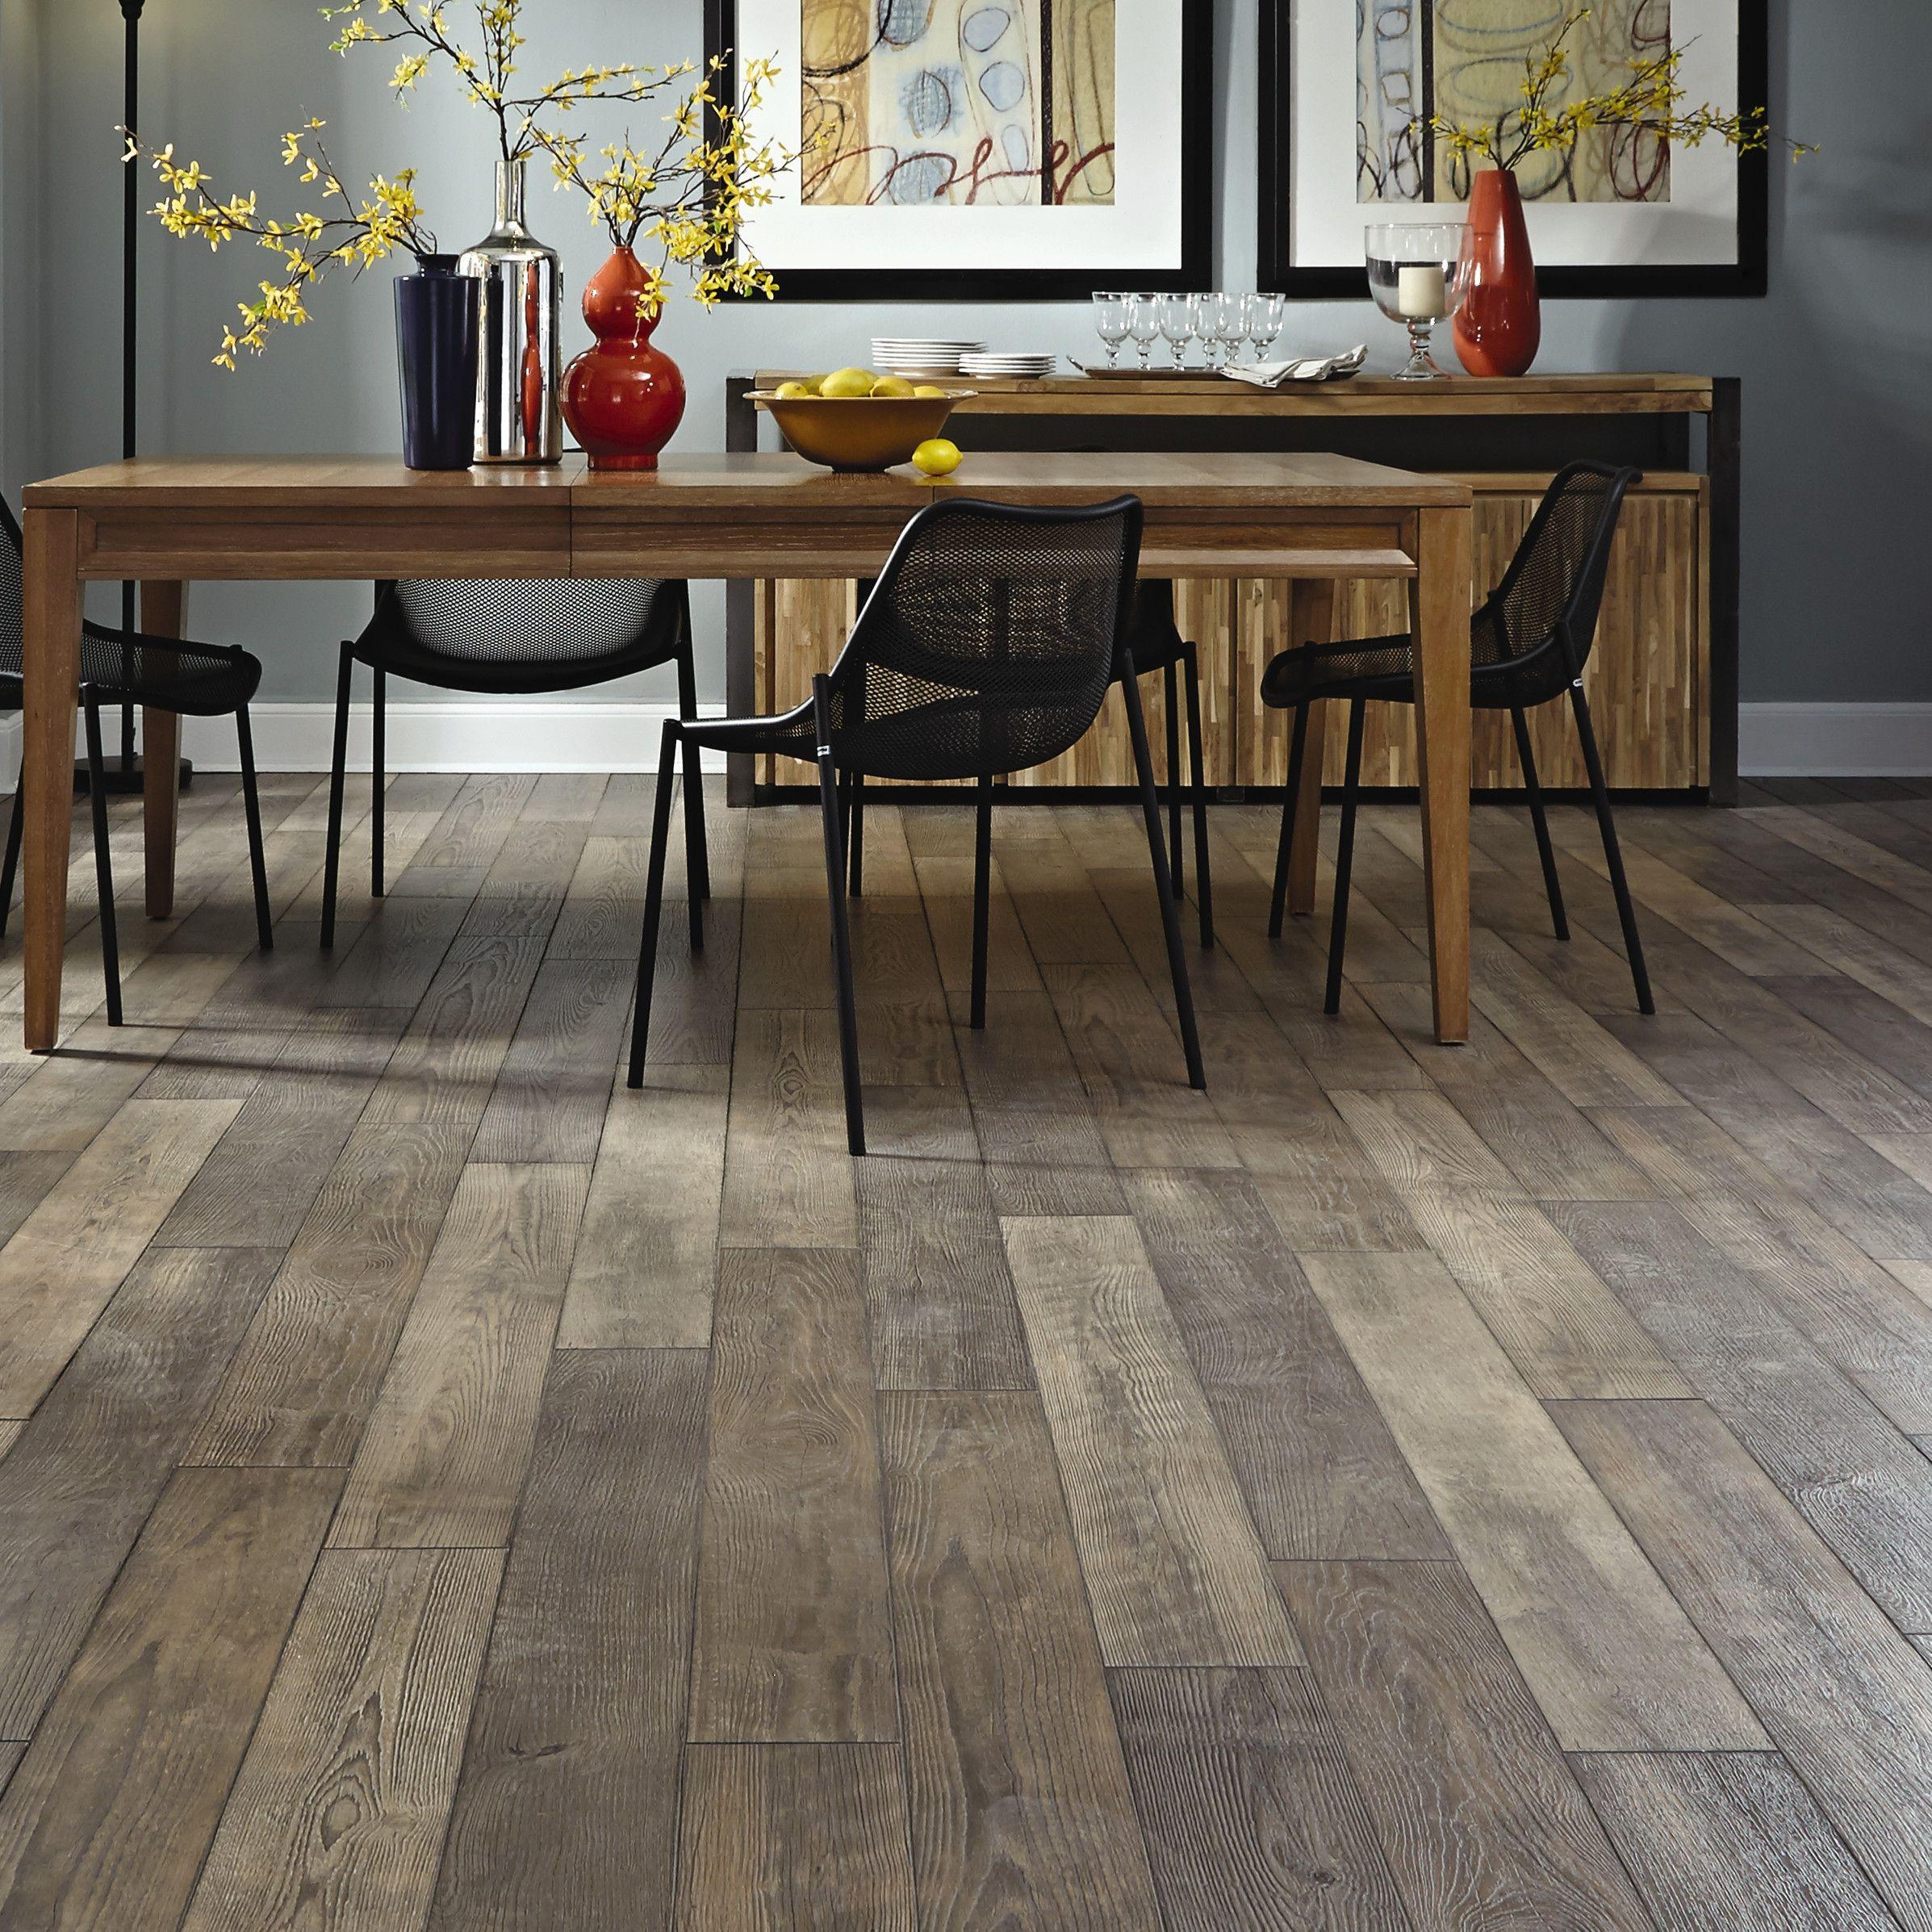 Restoration Collection 6 X 51 X 12mm Oak Laminate Flooring House Flooring Flooring Mannington Laminate Flooring